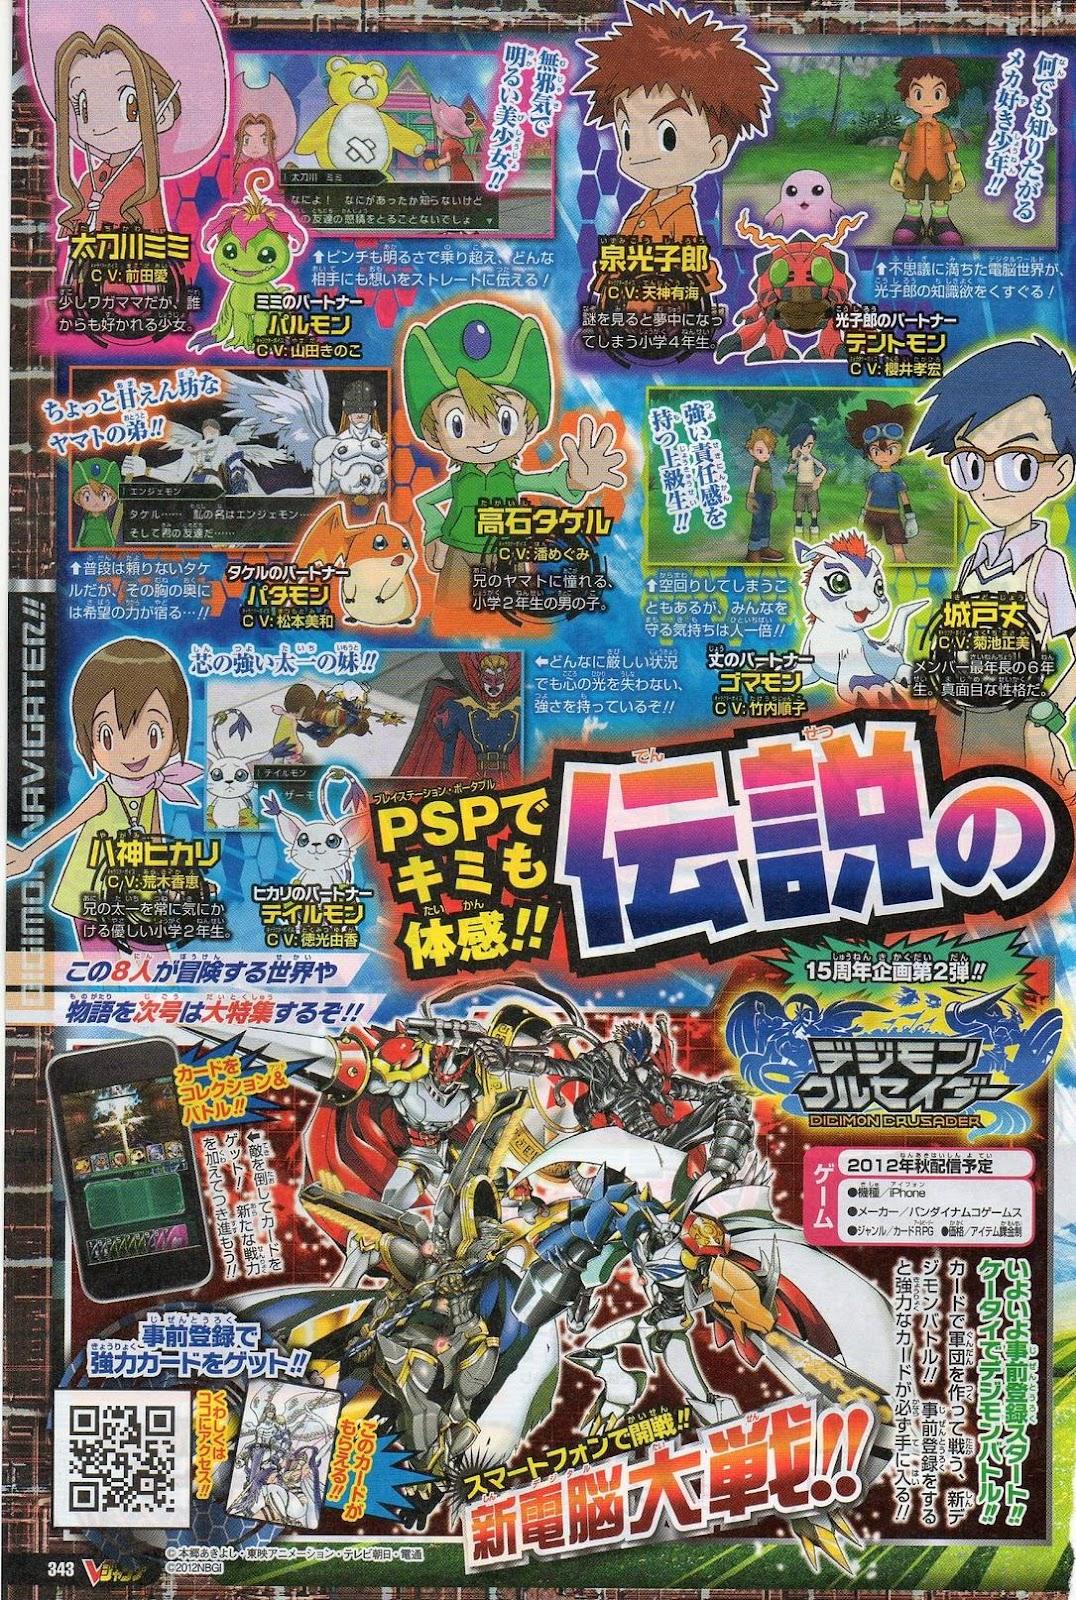 [V-Jump 11/2012] Digimon Crusaders + Digimon Adventure PSP V-JUMP+NOVEMBRO+Digimon+Adventure+PSP+e+Digimon+Crusaders